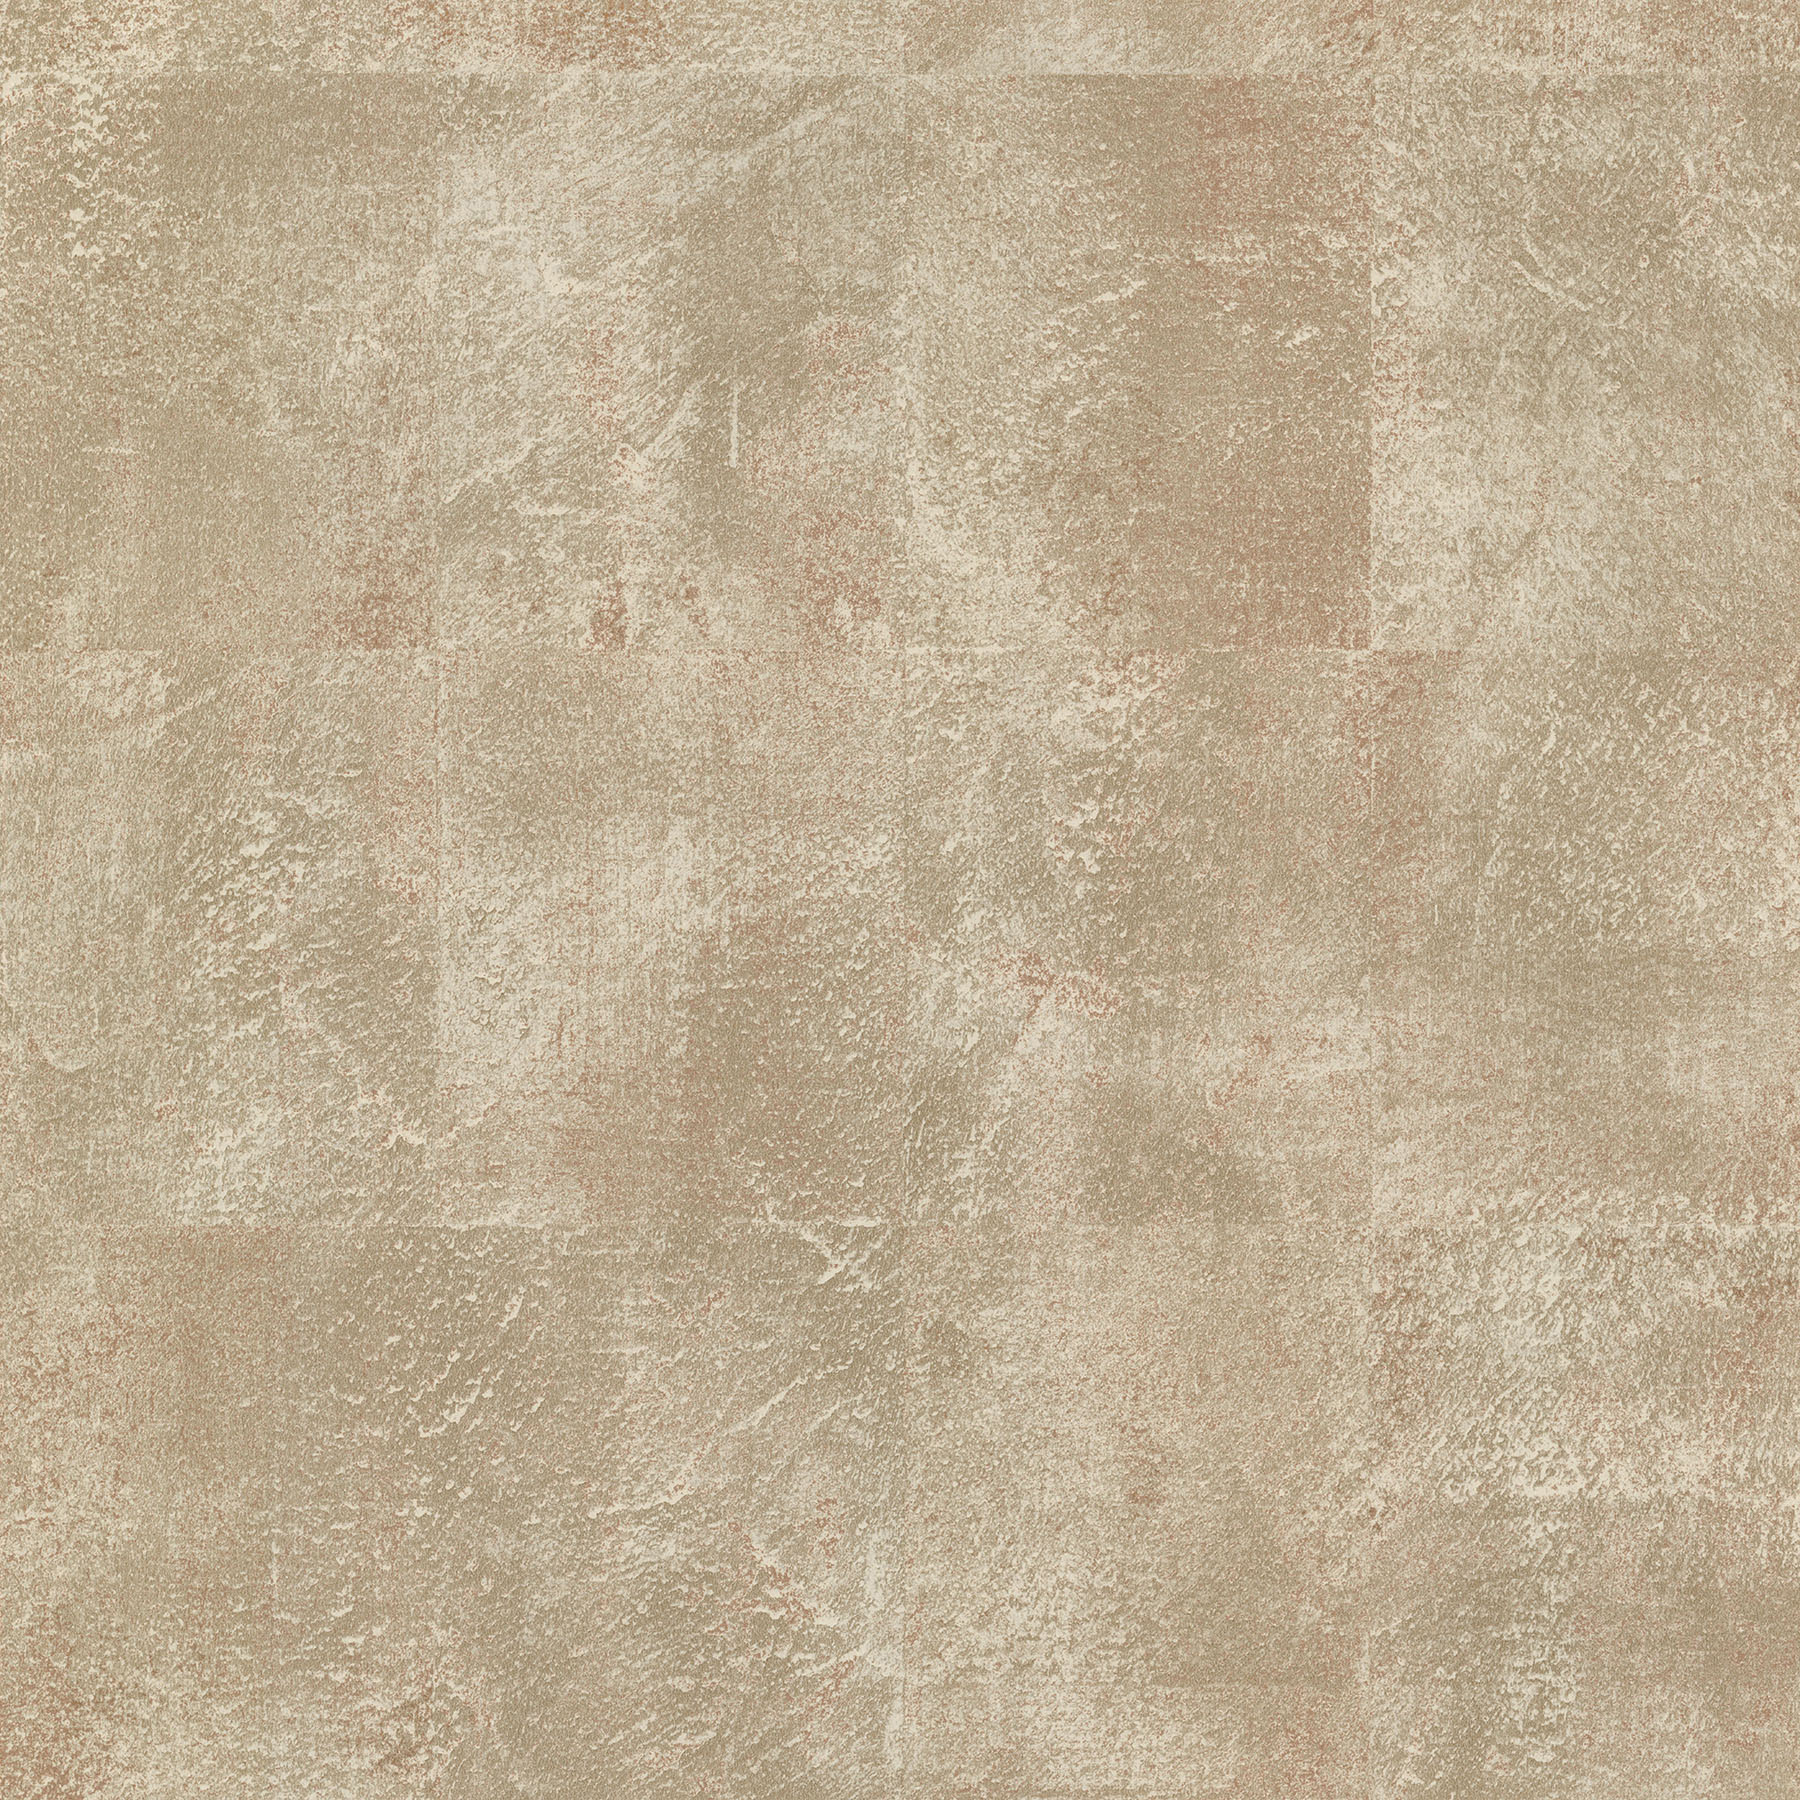 Picture of Azoic Copper Brushstroke Squares Wallpaper